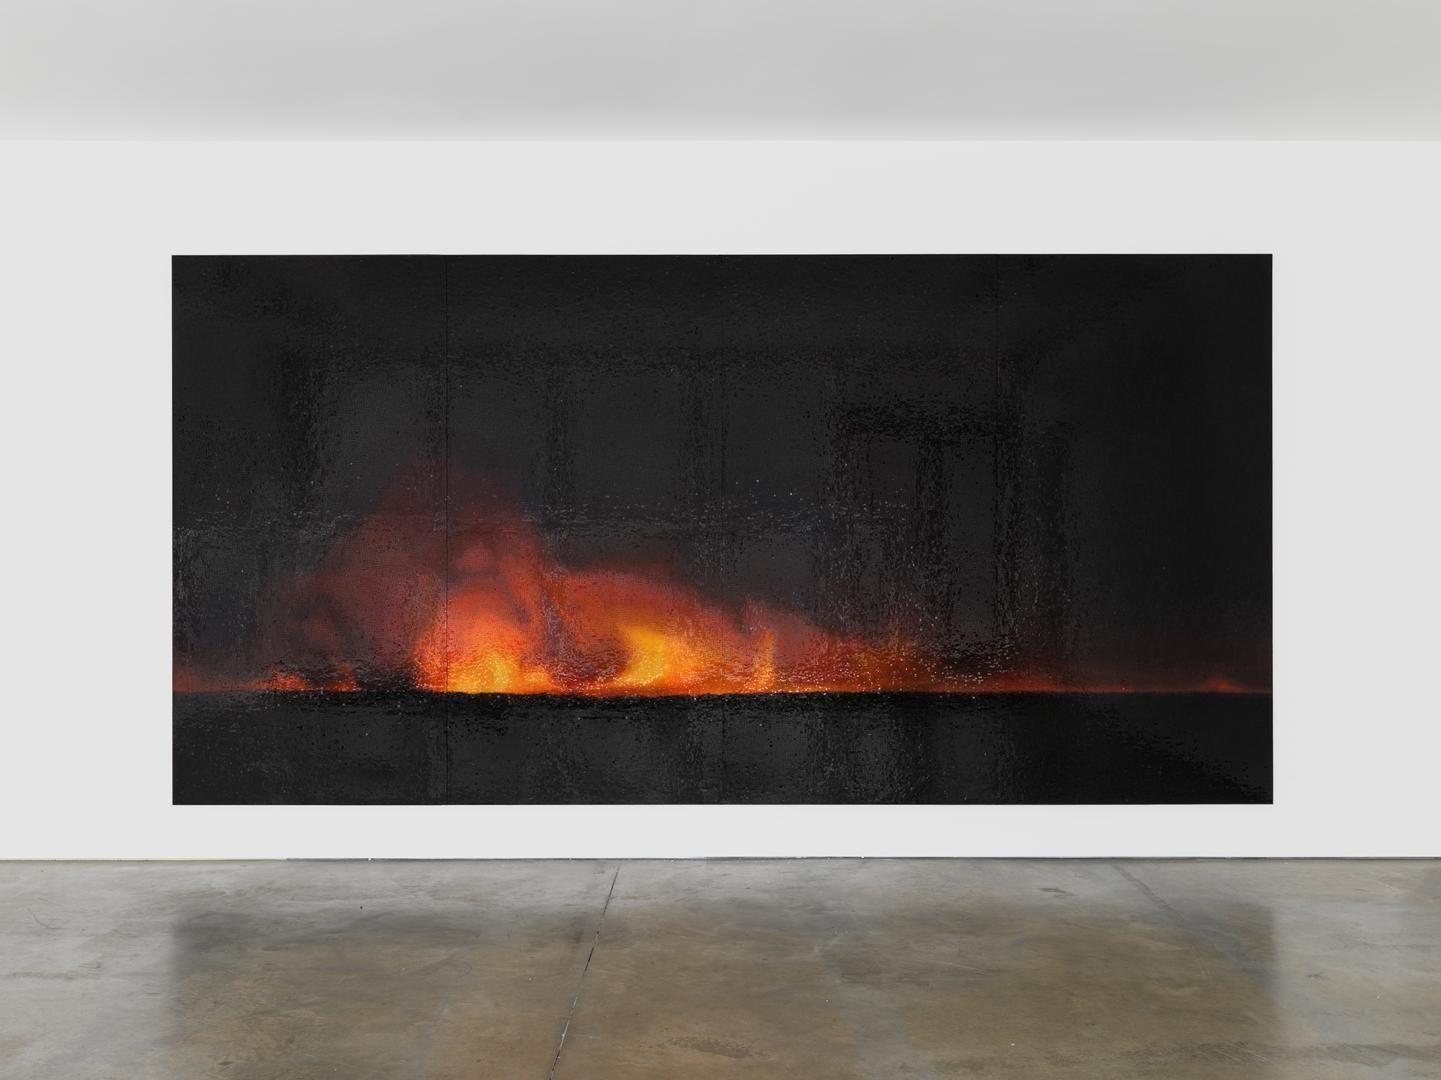 TERESITA FERNÁNDEZ Fire (America) 5, 2016